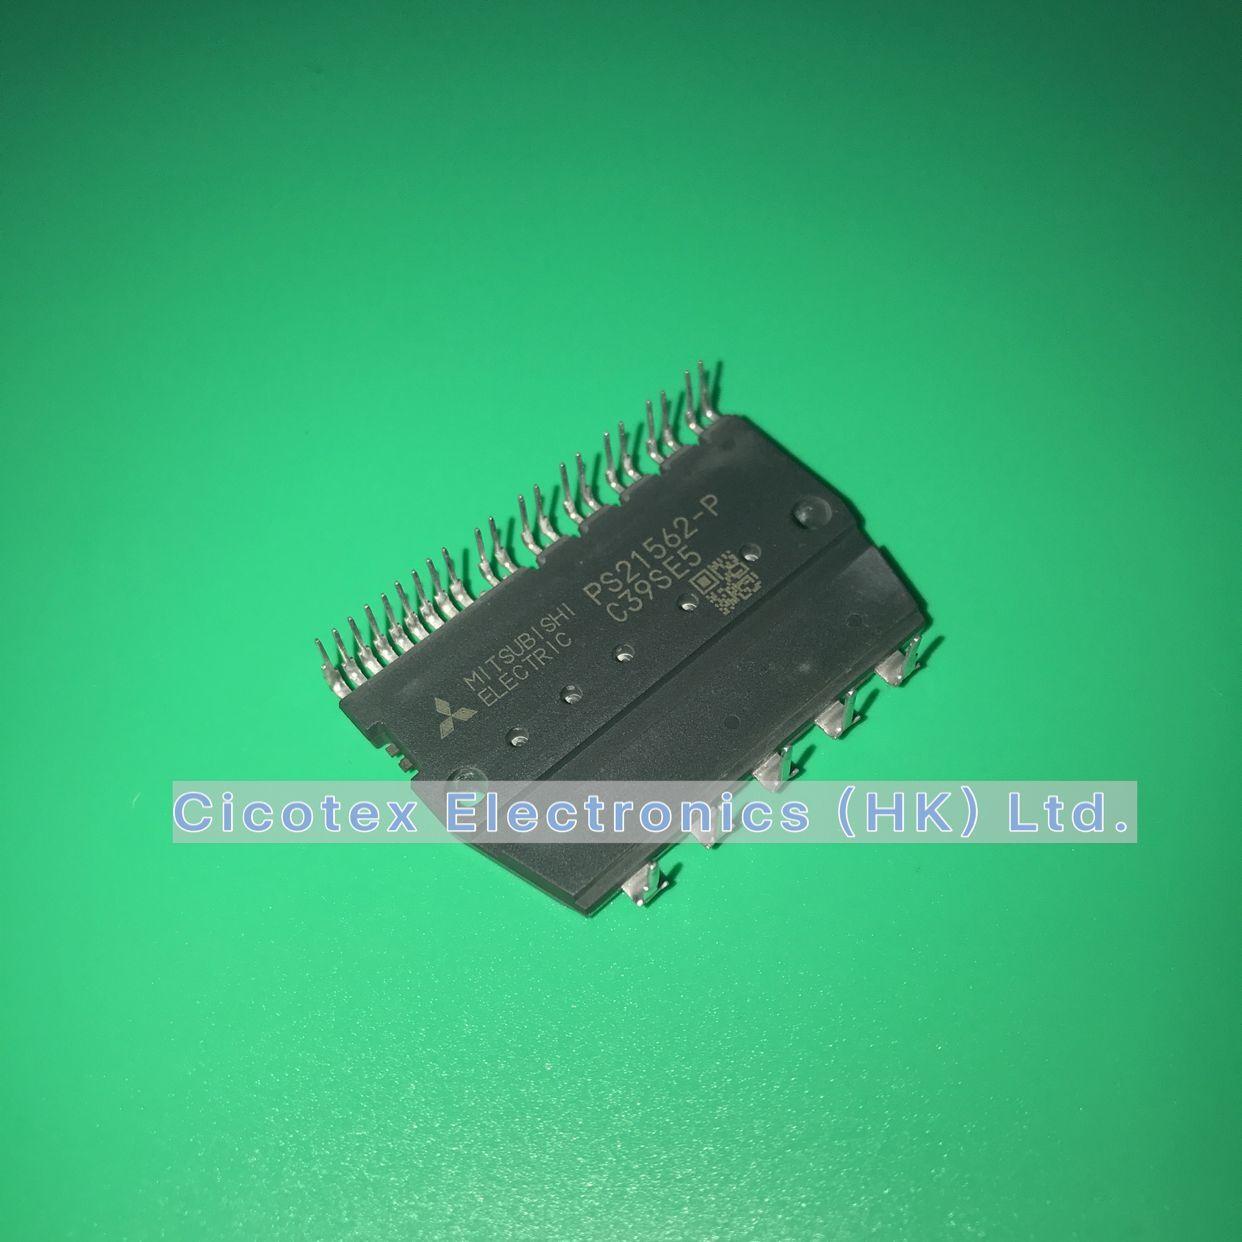 Модуль PS21562-P IGBT PS21562P MOD IPM 600V 5A MINI DIP 21562-P